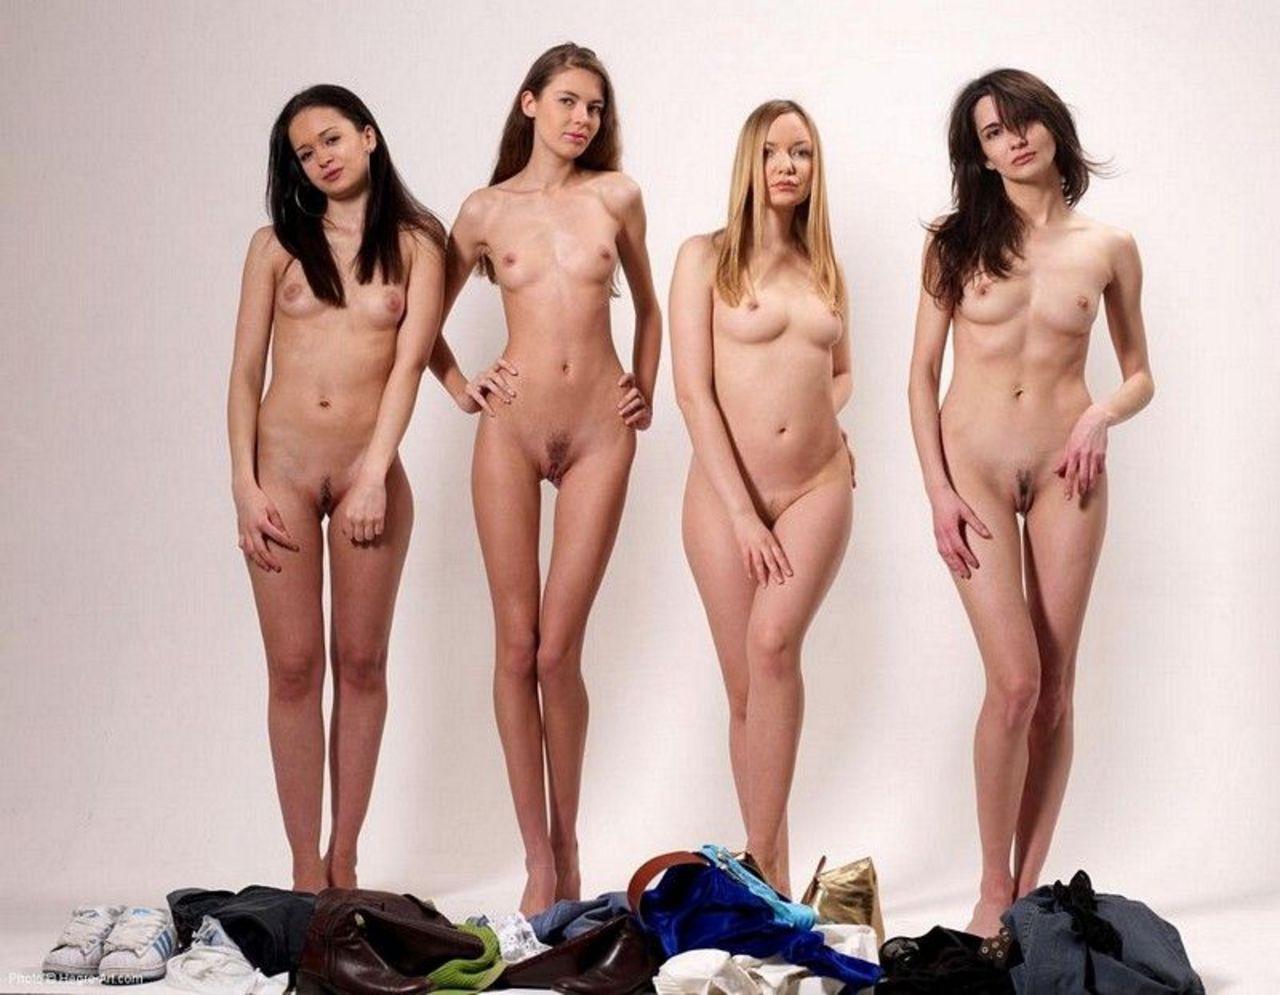 Фото женщин раздетыми на работе 12 фотография